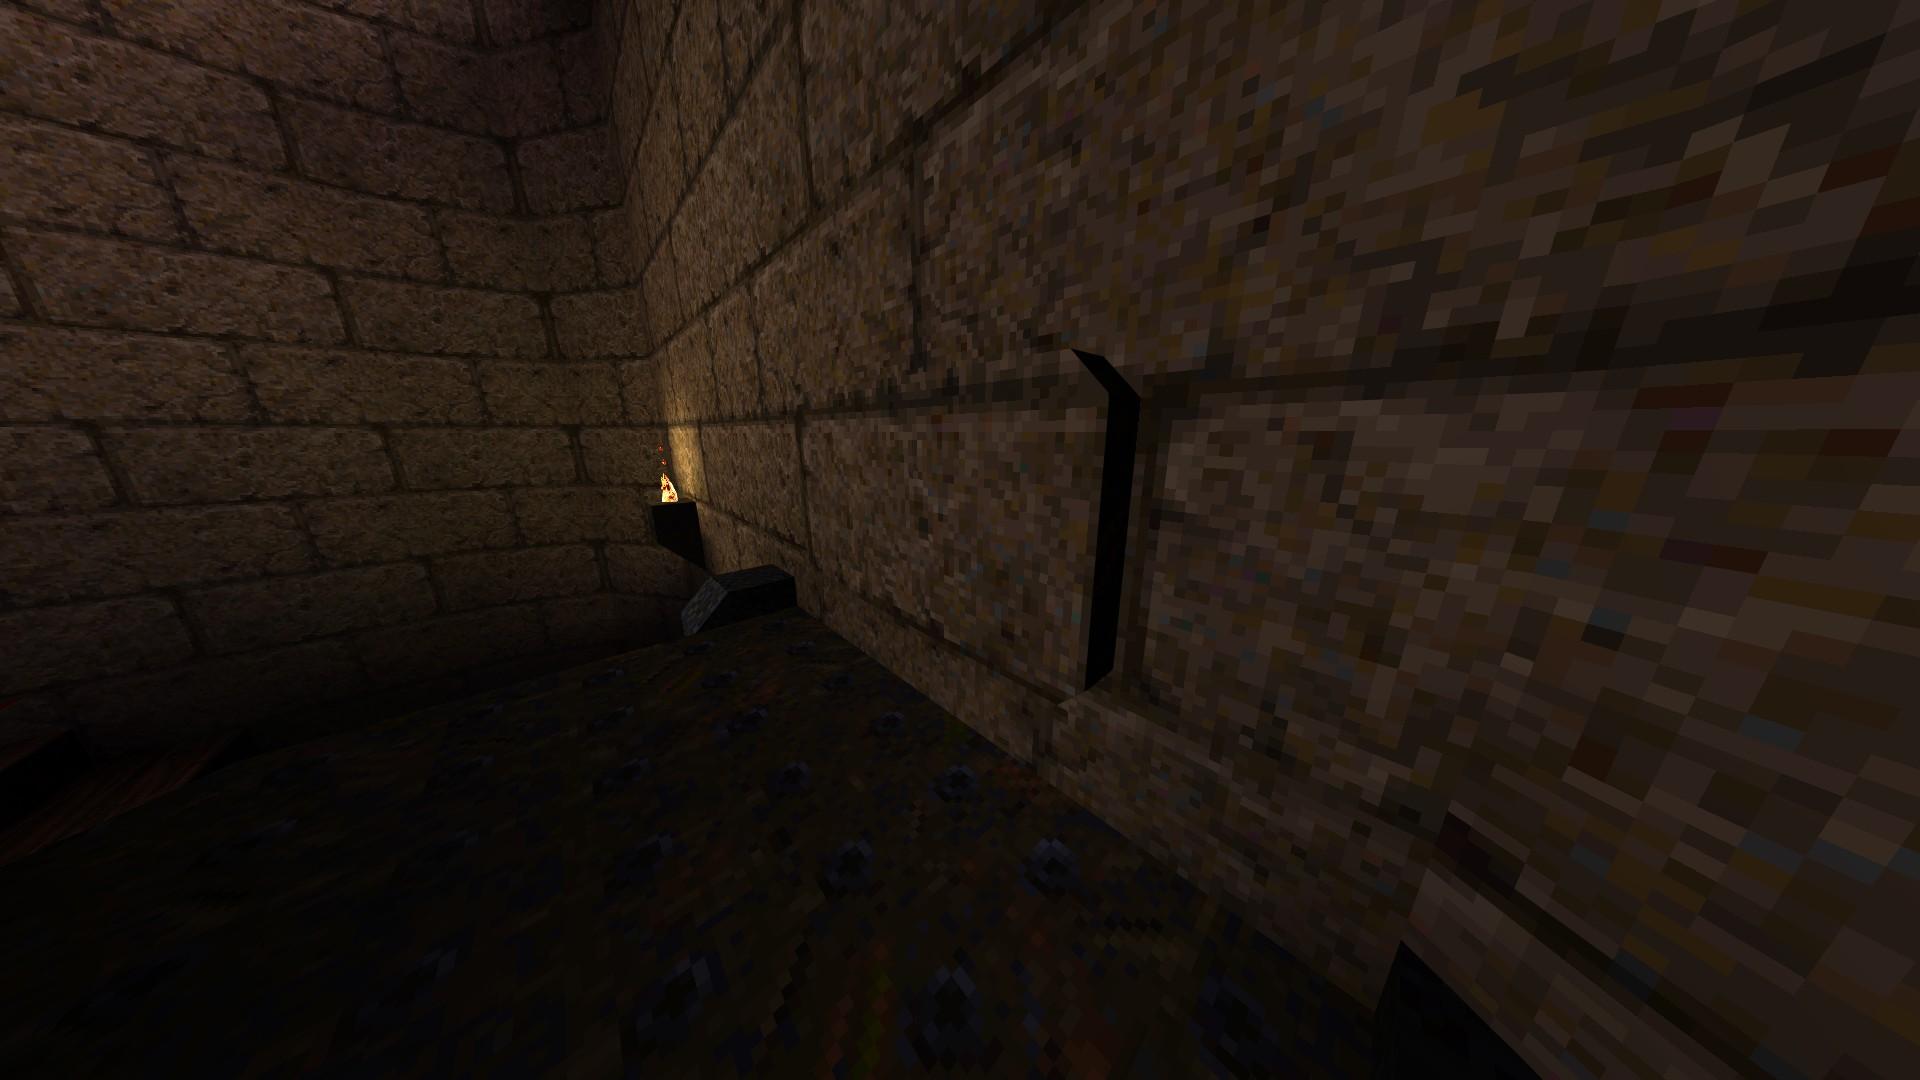 Quake - Locations of All Secrets in Game Tips - E2: Dominion of Darkness - Part I - 5161E81